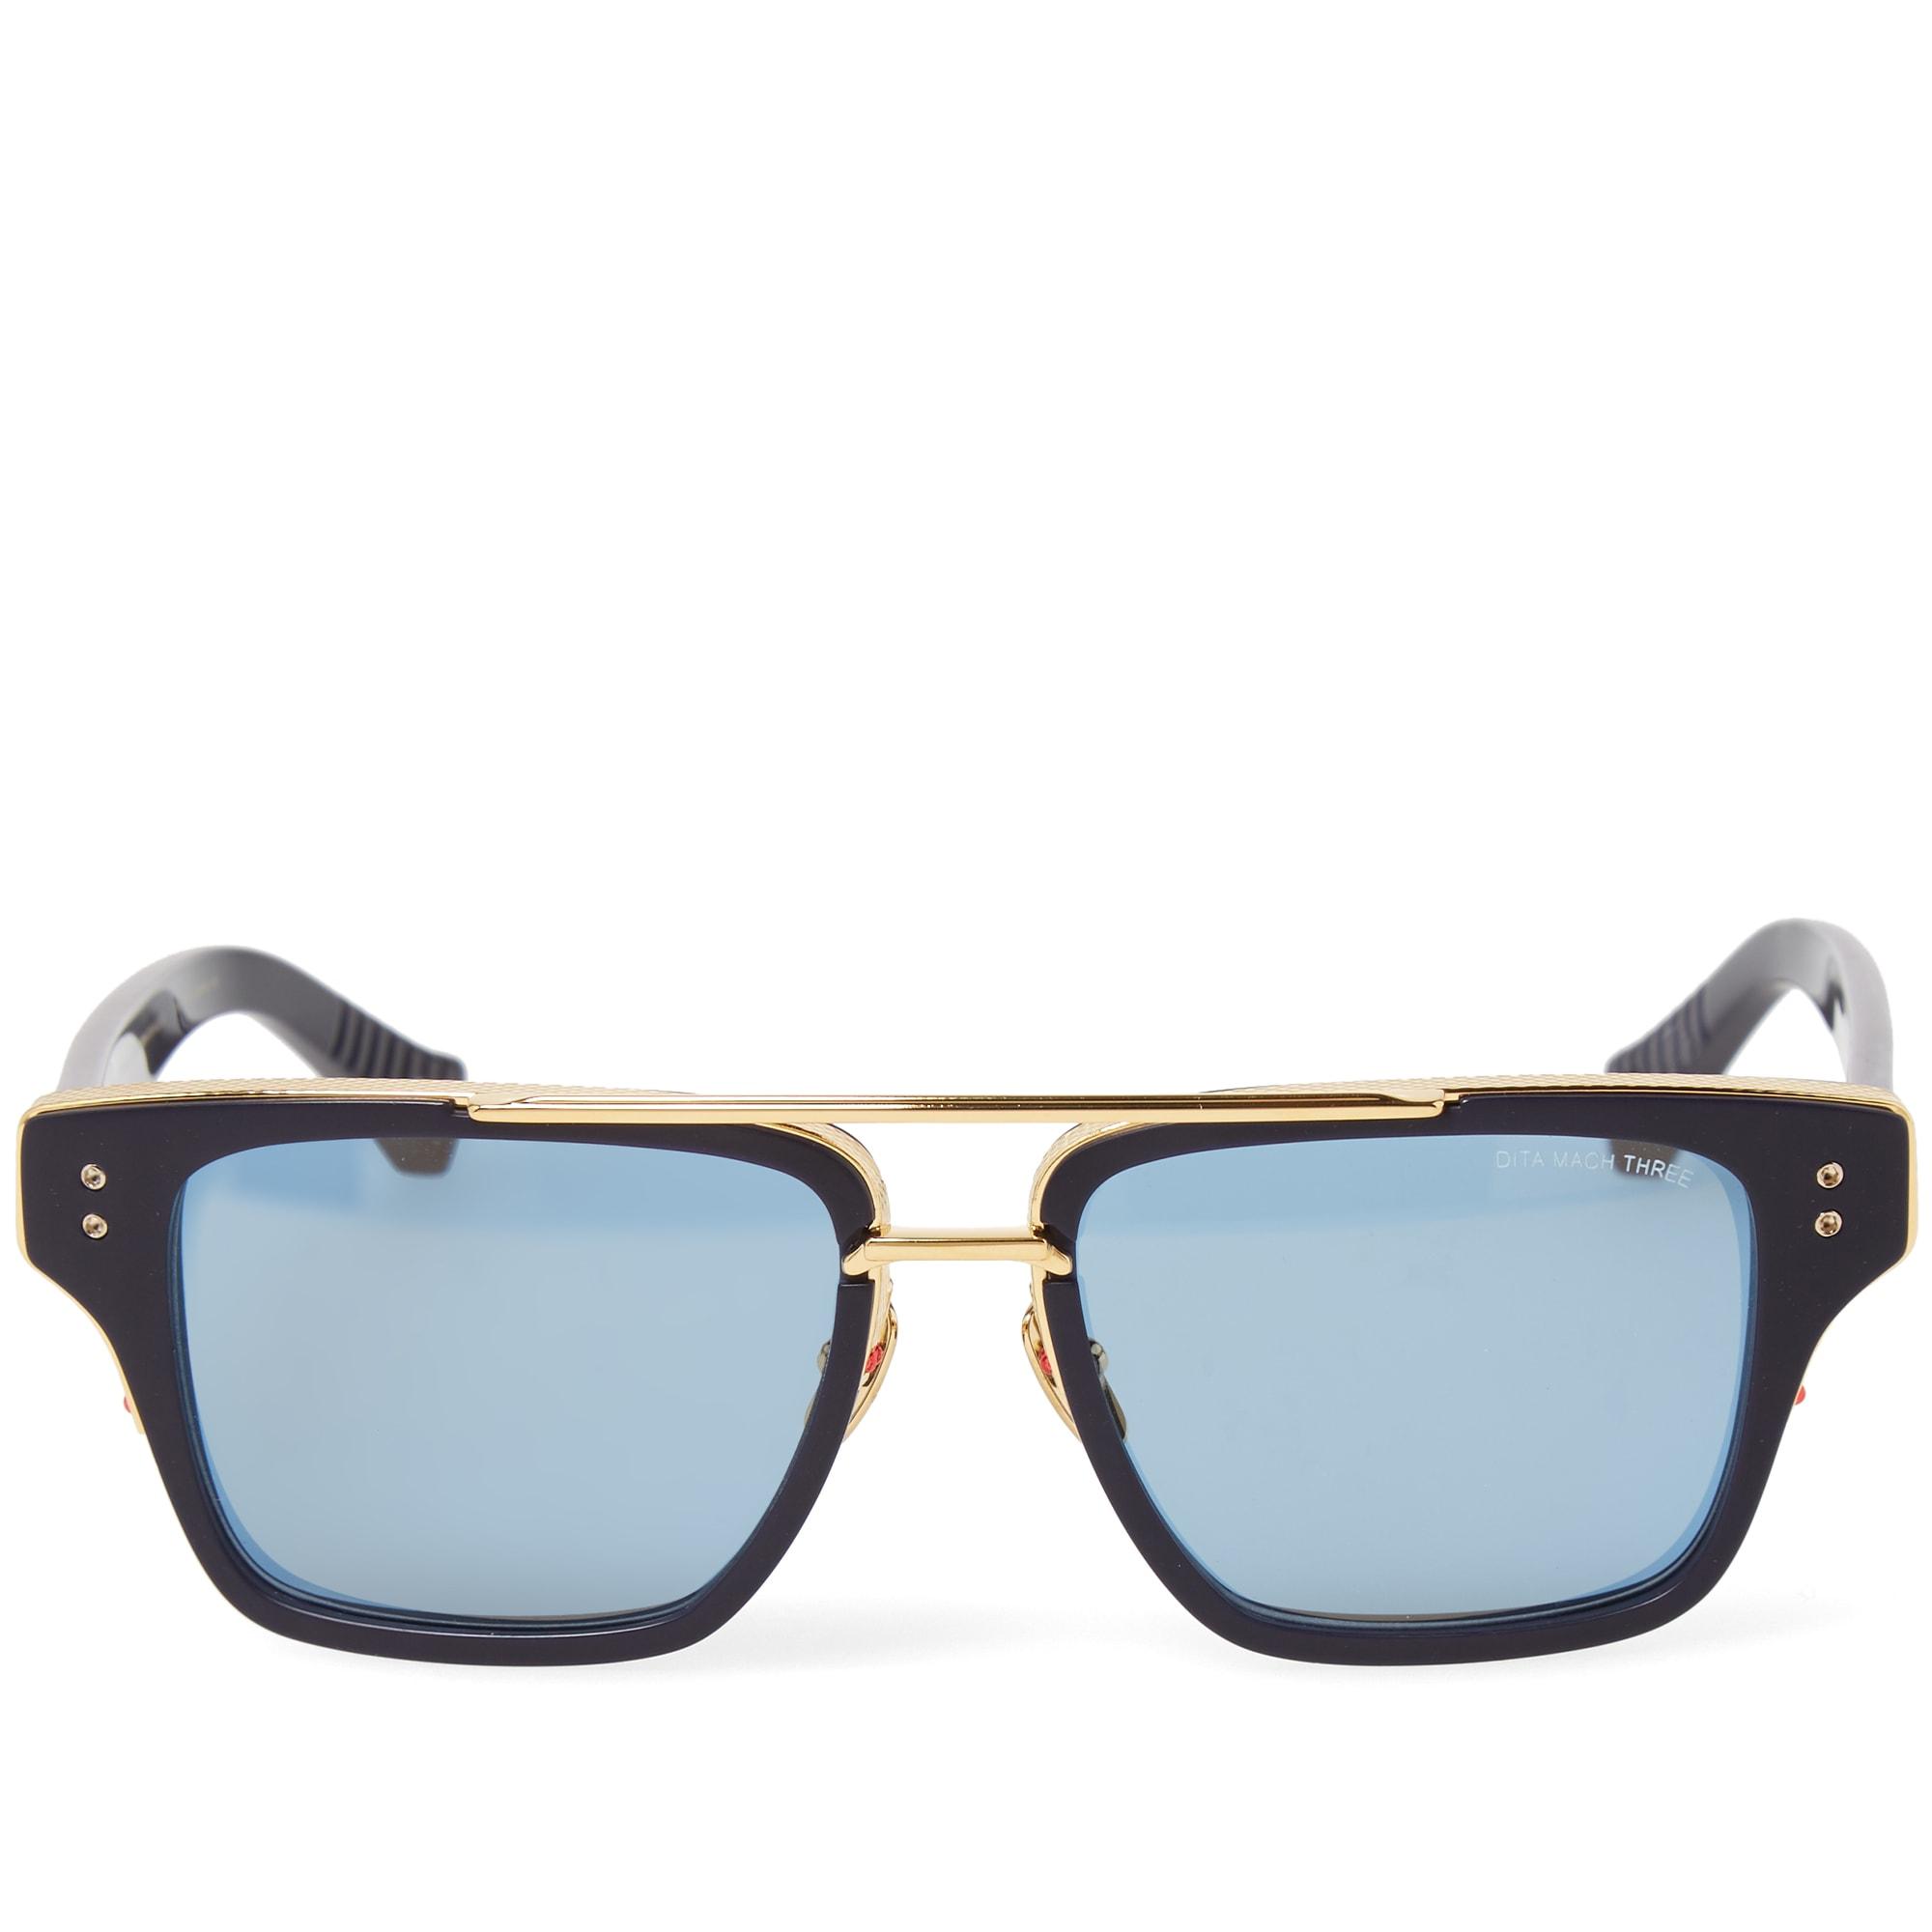 Blue Sunglasses 33bn